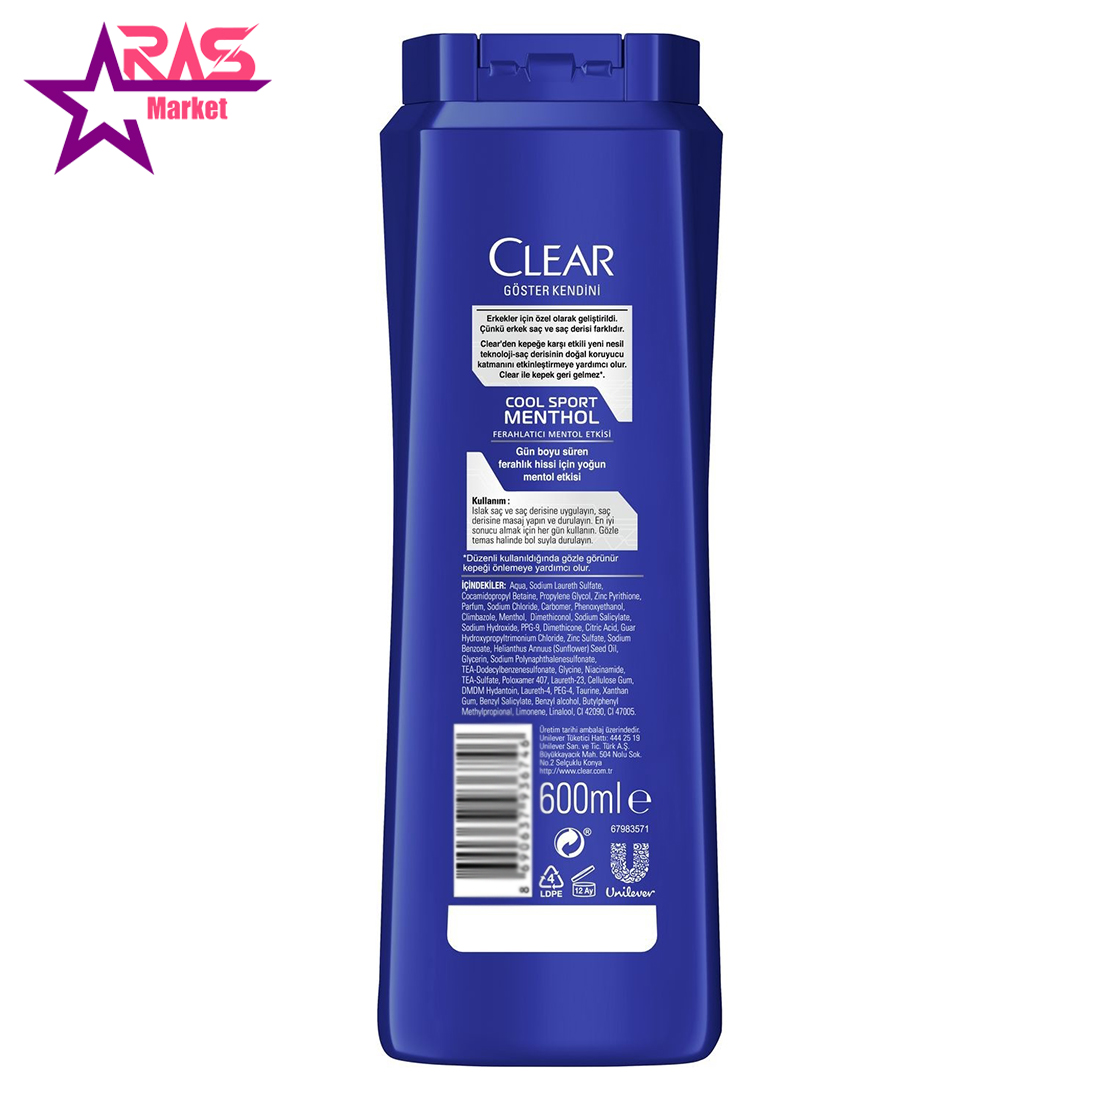 شامپو مردانه کلیر ضد شوره مدل Cool Sport حاوی عصاره نعنا 600 میلی لیتر ، فروشگاه اینترنتی ارس مارکت ، clear men shampoo